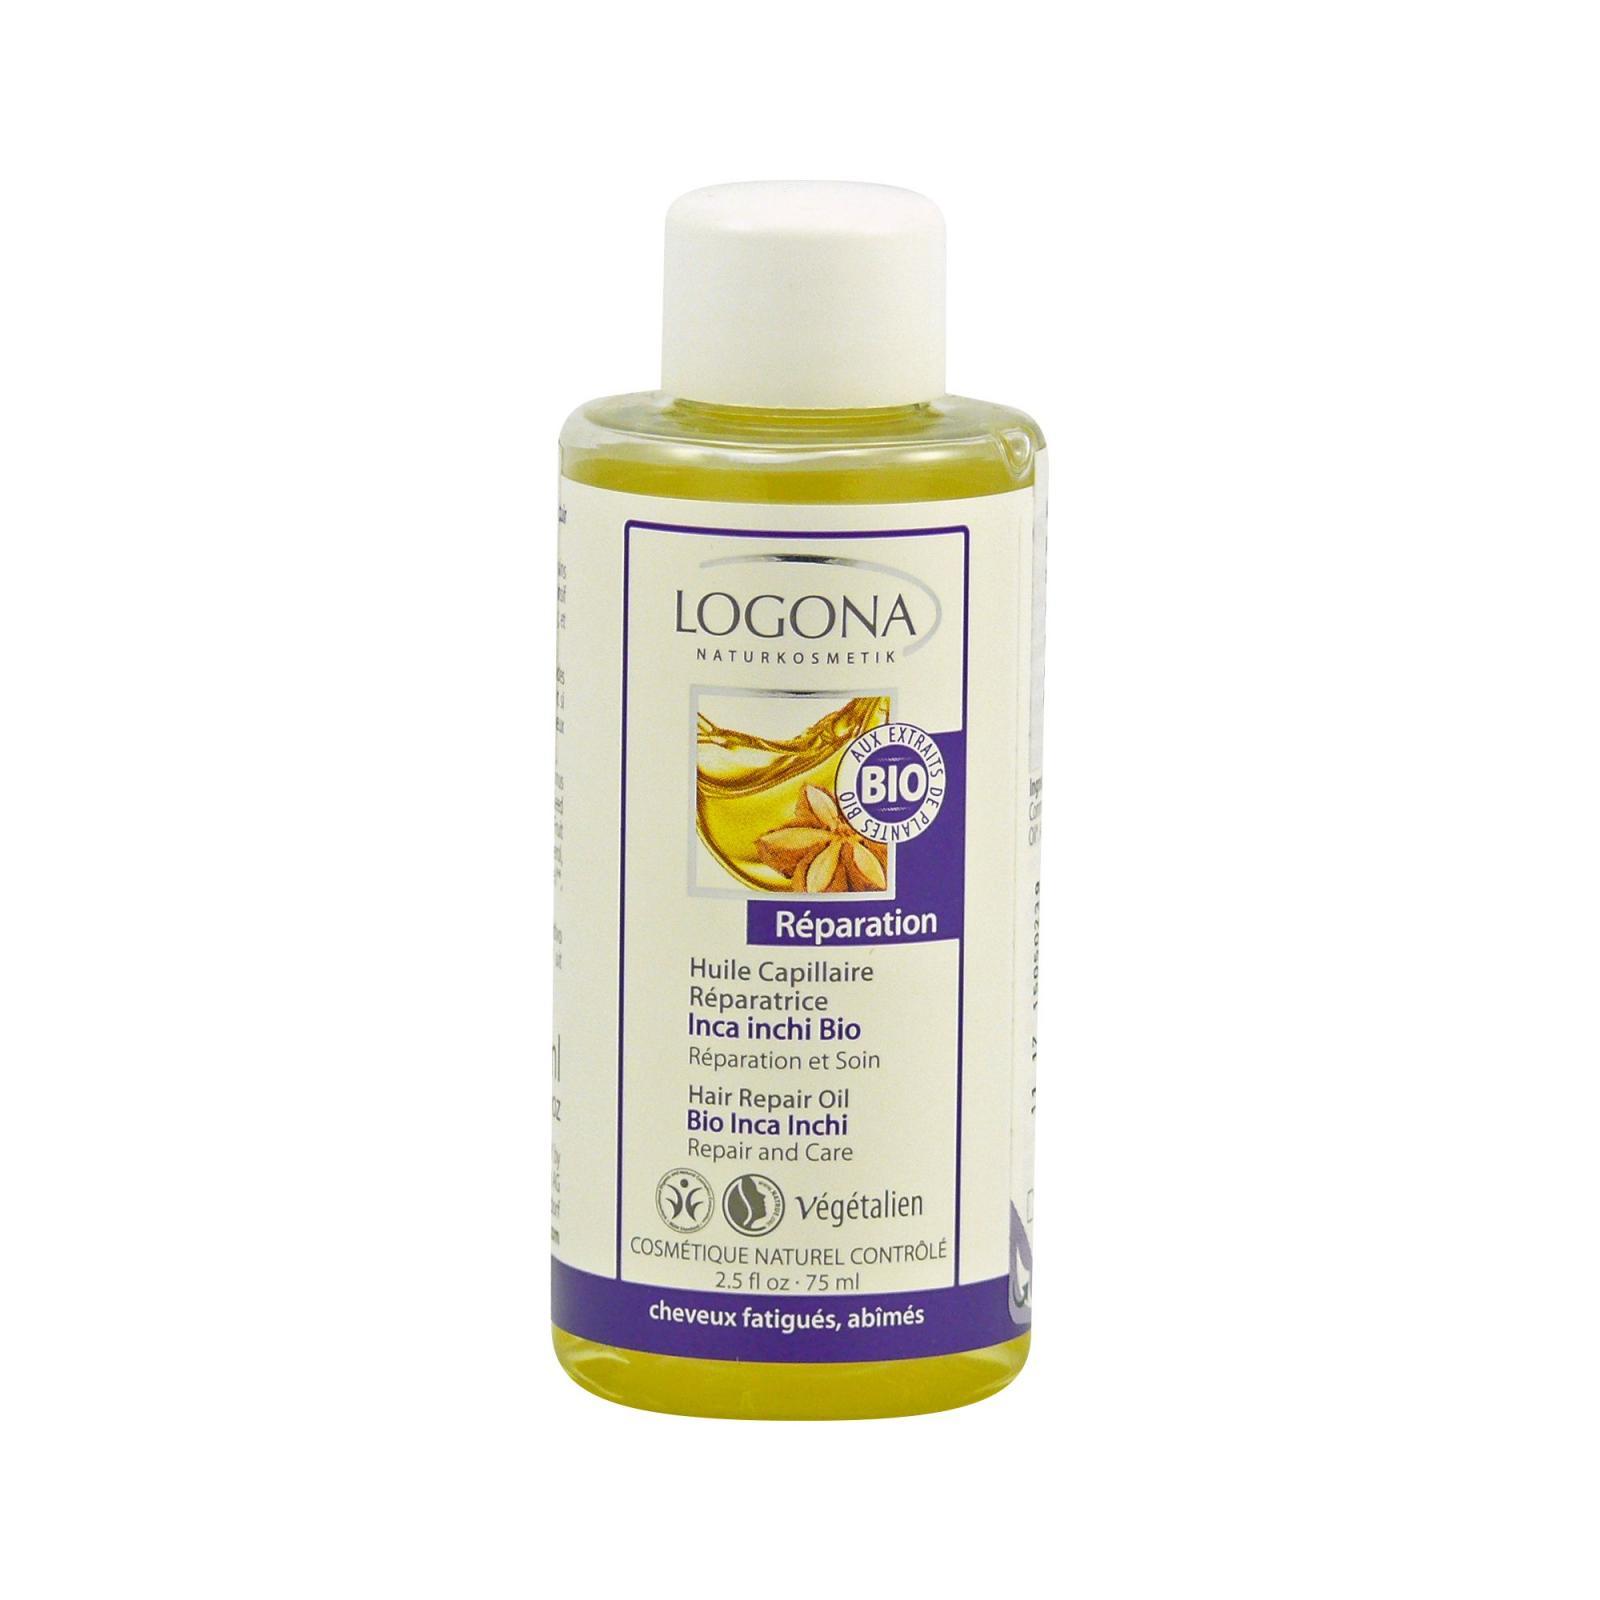 Logona Regenerační vlasový olej Bio Inca Inchi 75 ml